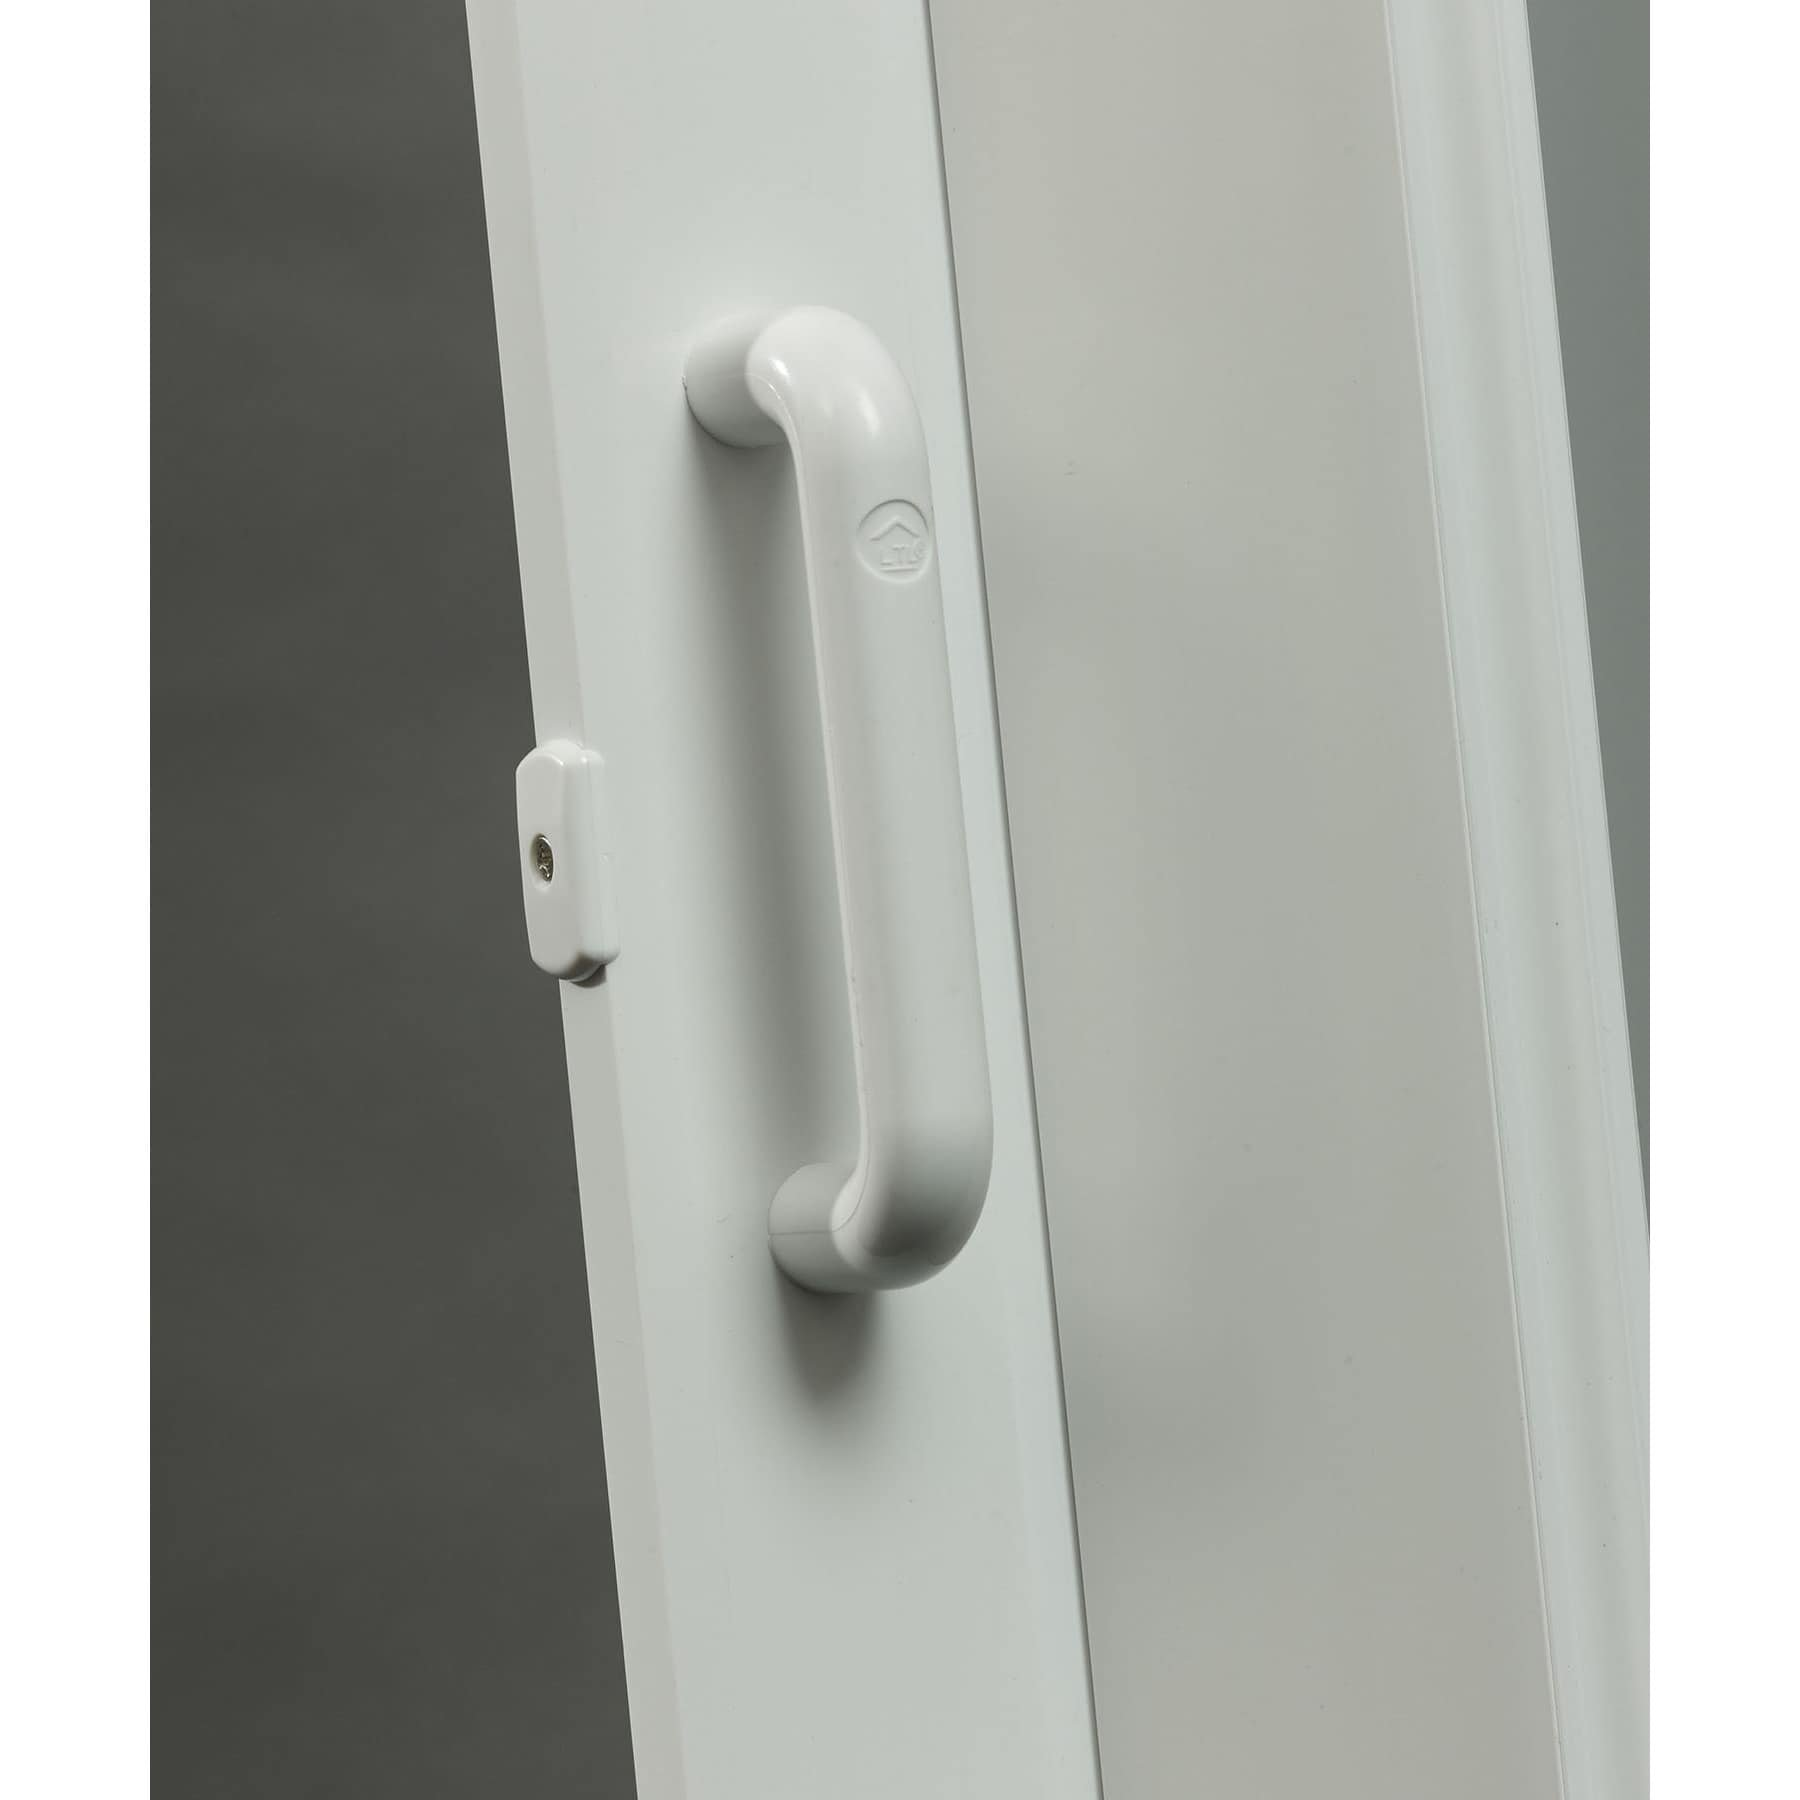 Ltl Home Products En3280hl Spectrum Encore Folding Accordion Door